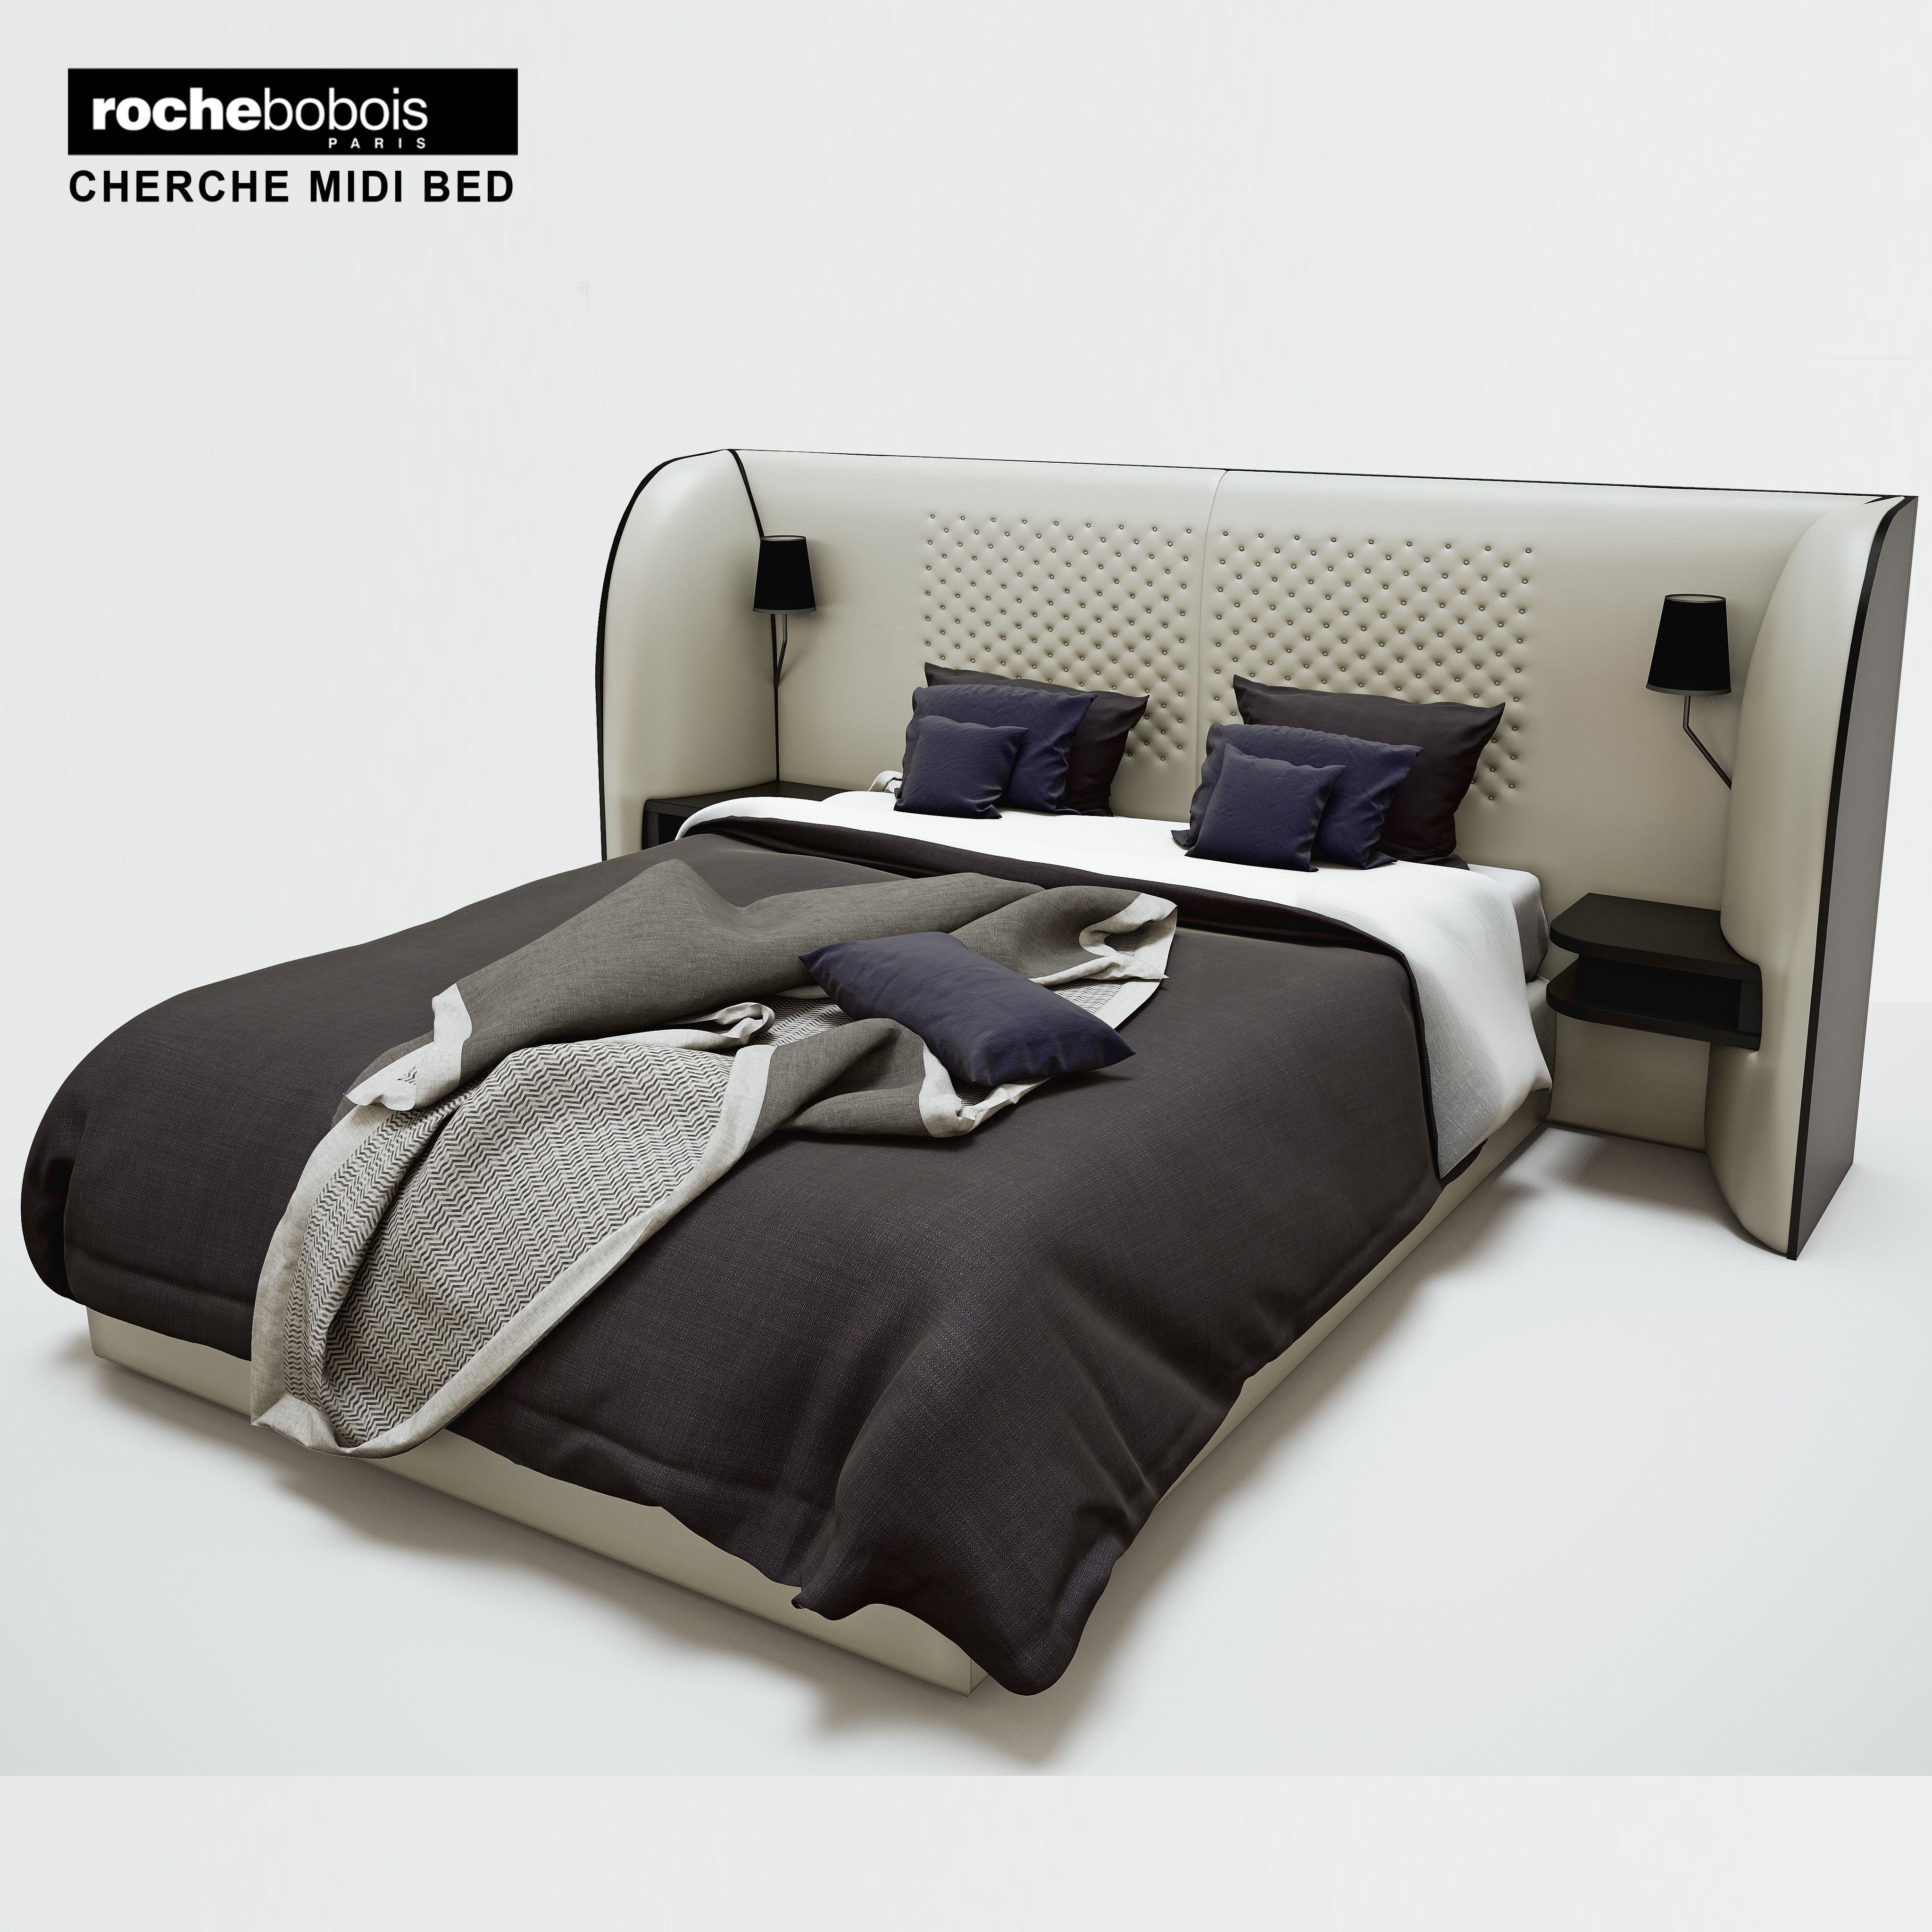 Roche bobois 3D Models